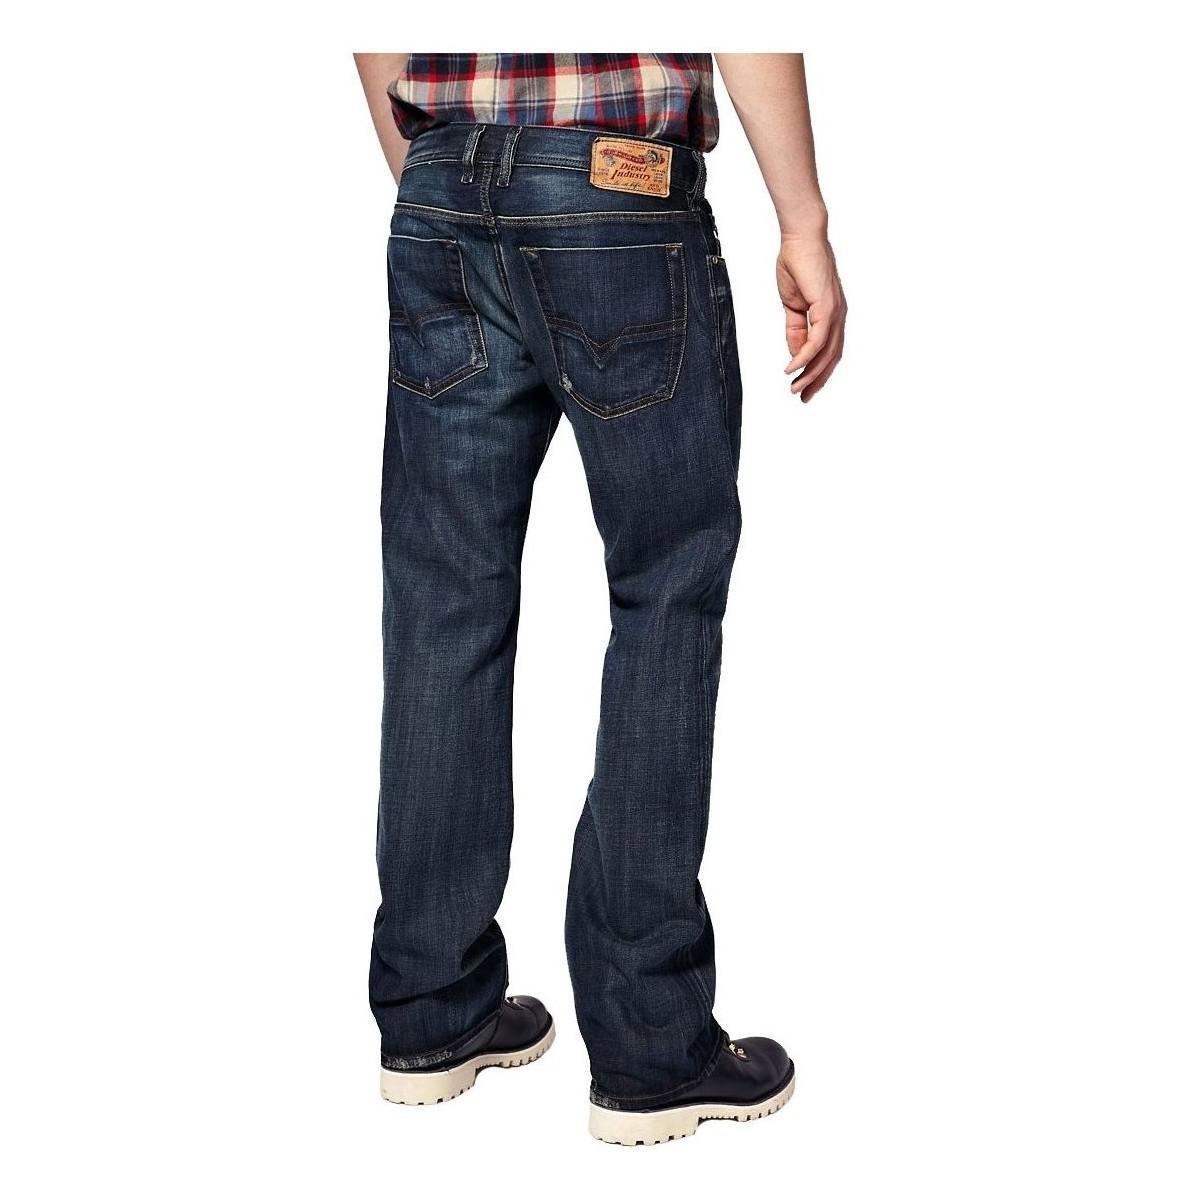 9072af10a77 DIESEL - Men's Jeans Zatiny 882w - Regular Bootcut Men's In Blue in ...